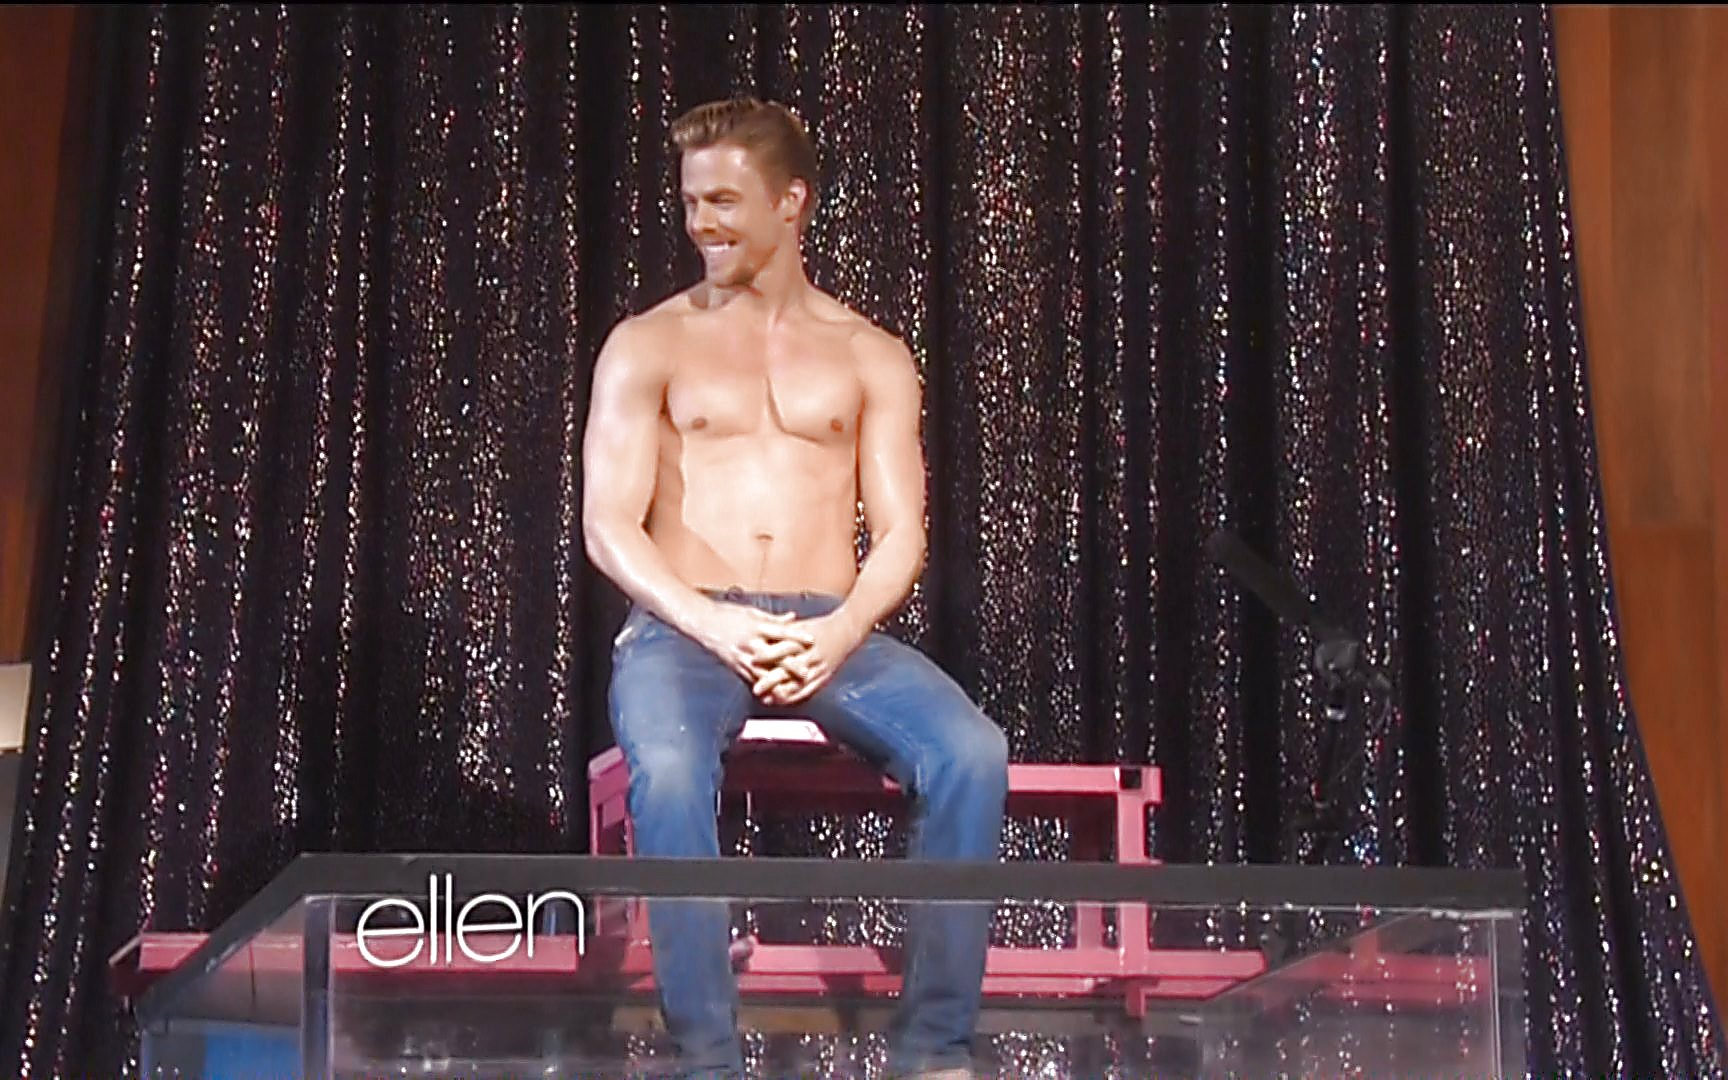 Derek Hough sexy shirtless scene November 2, 2014, 9pm